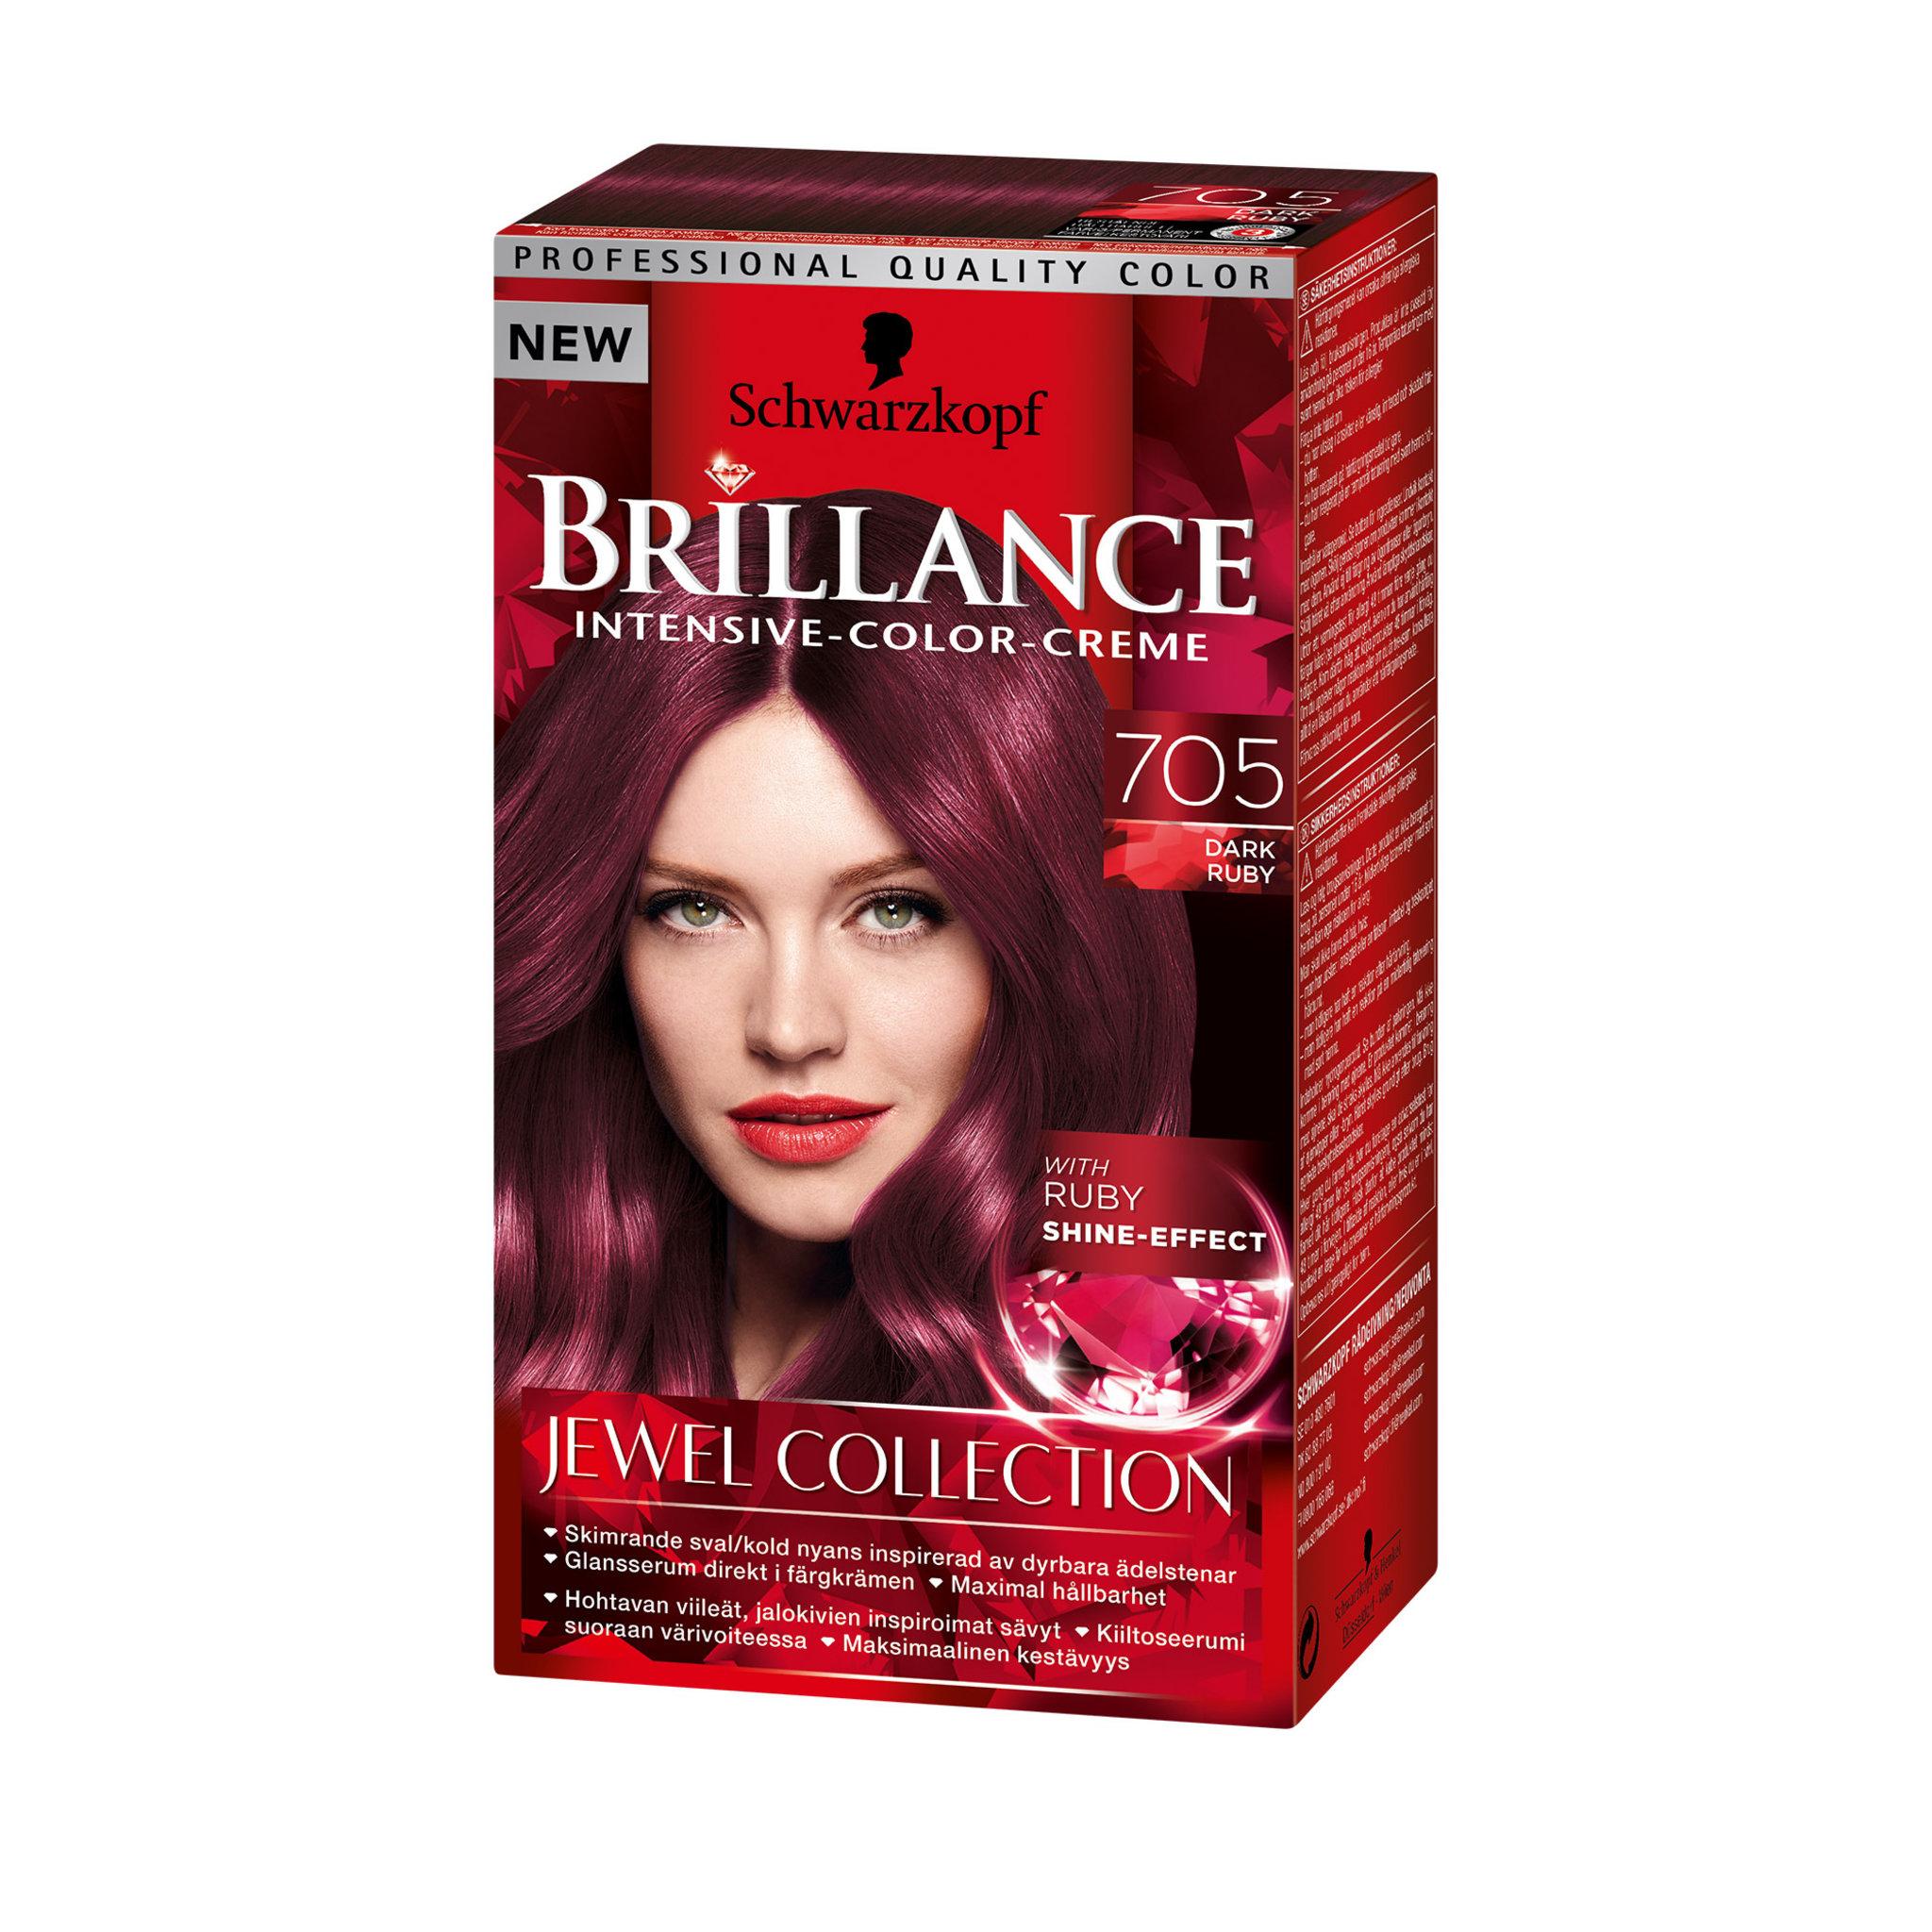 köpa professionell hårfärg